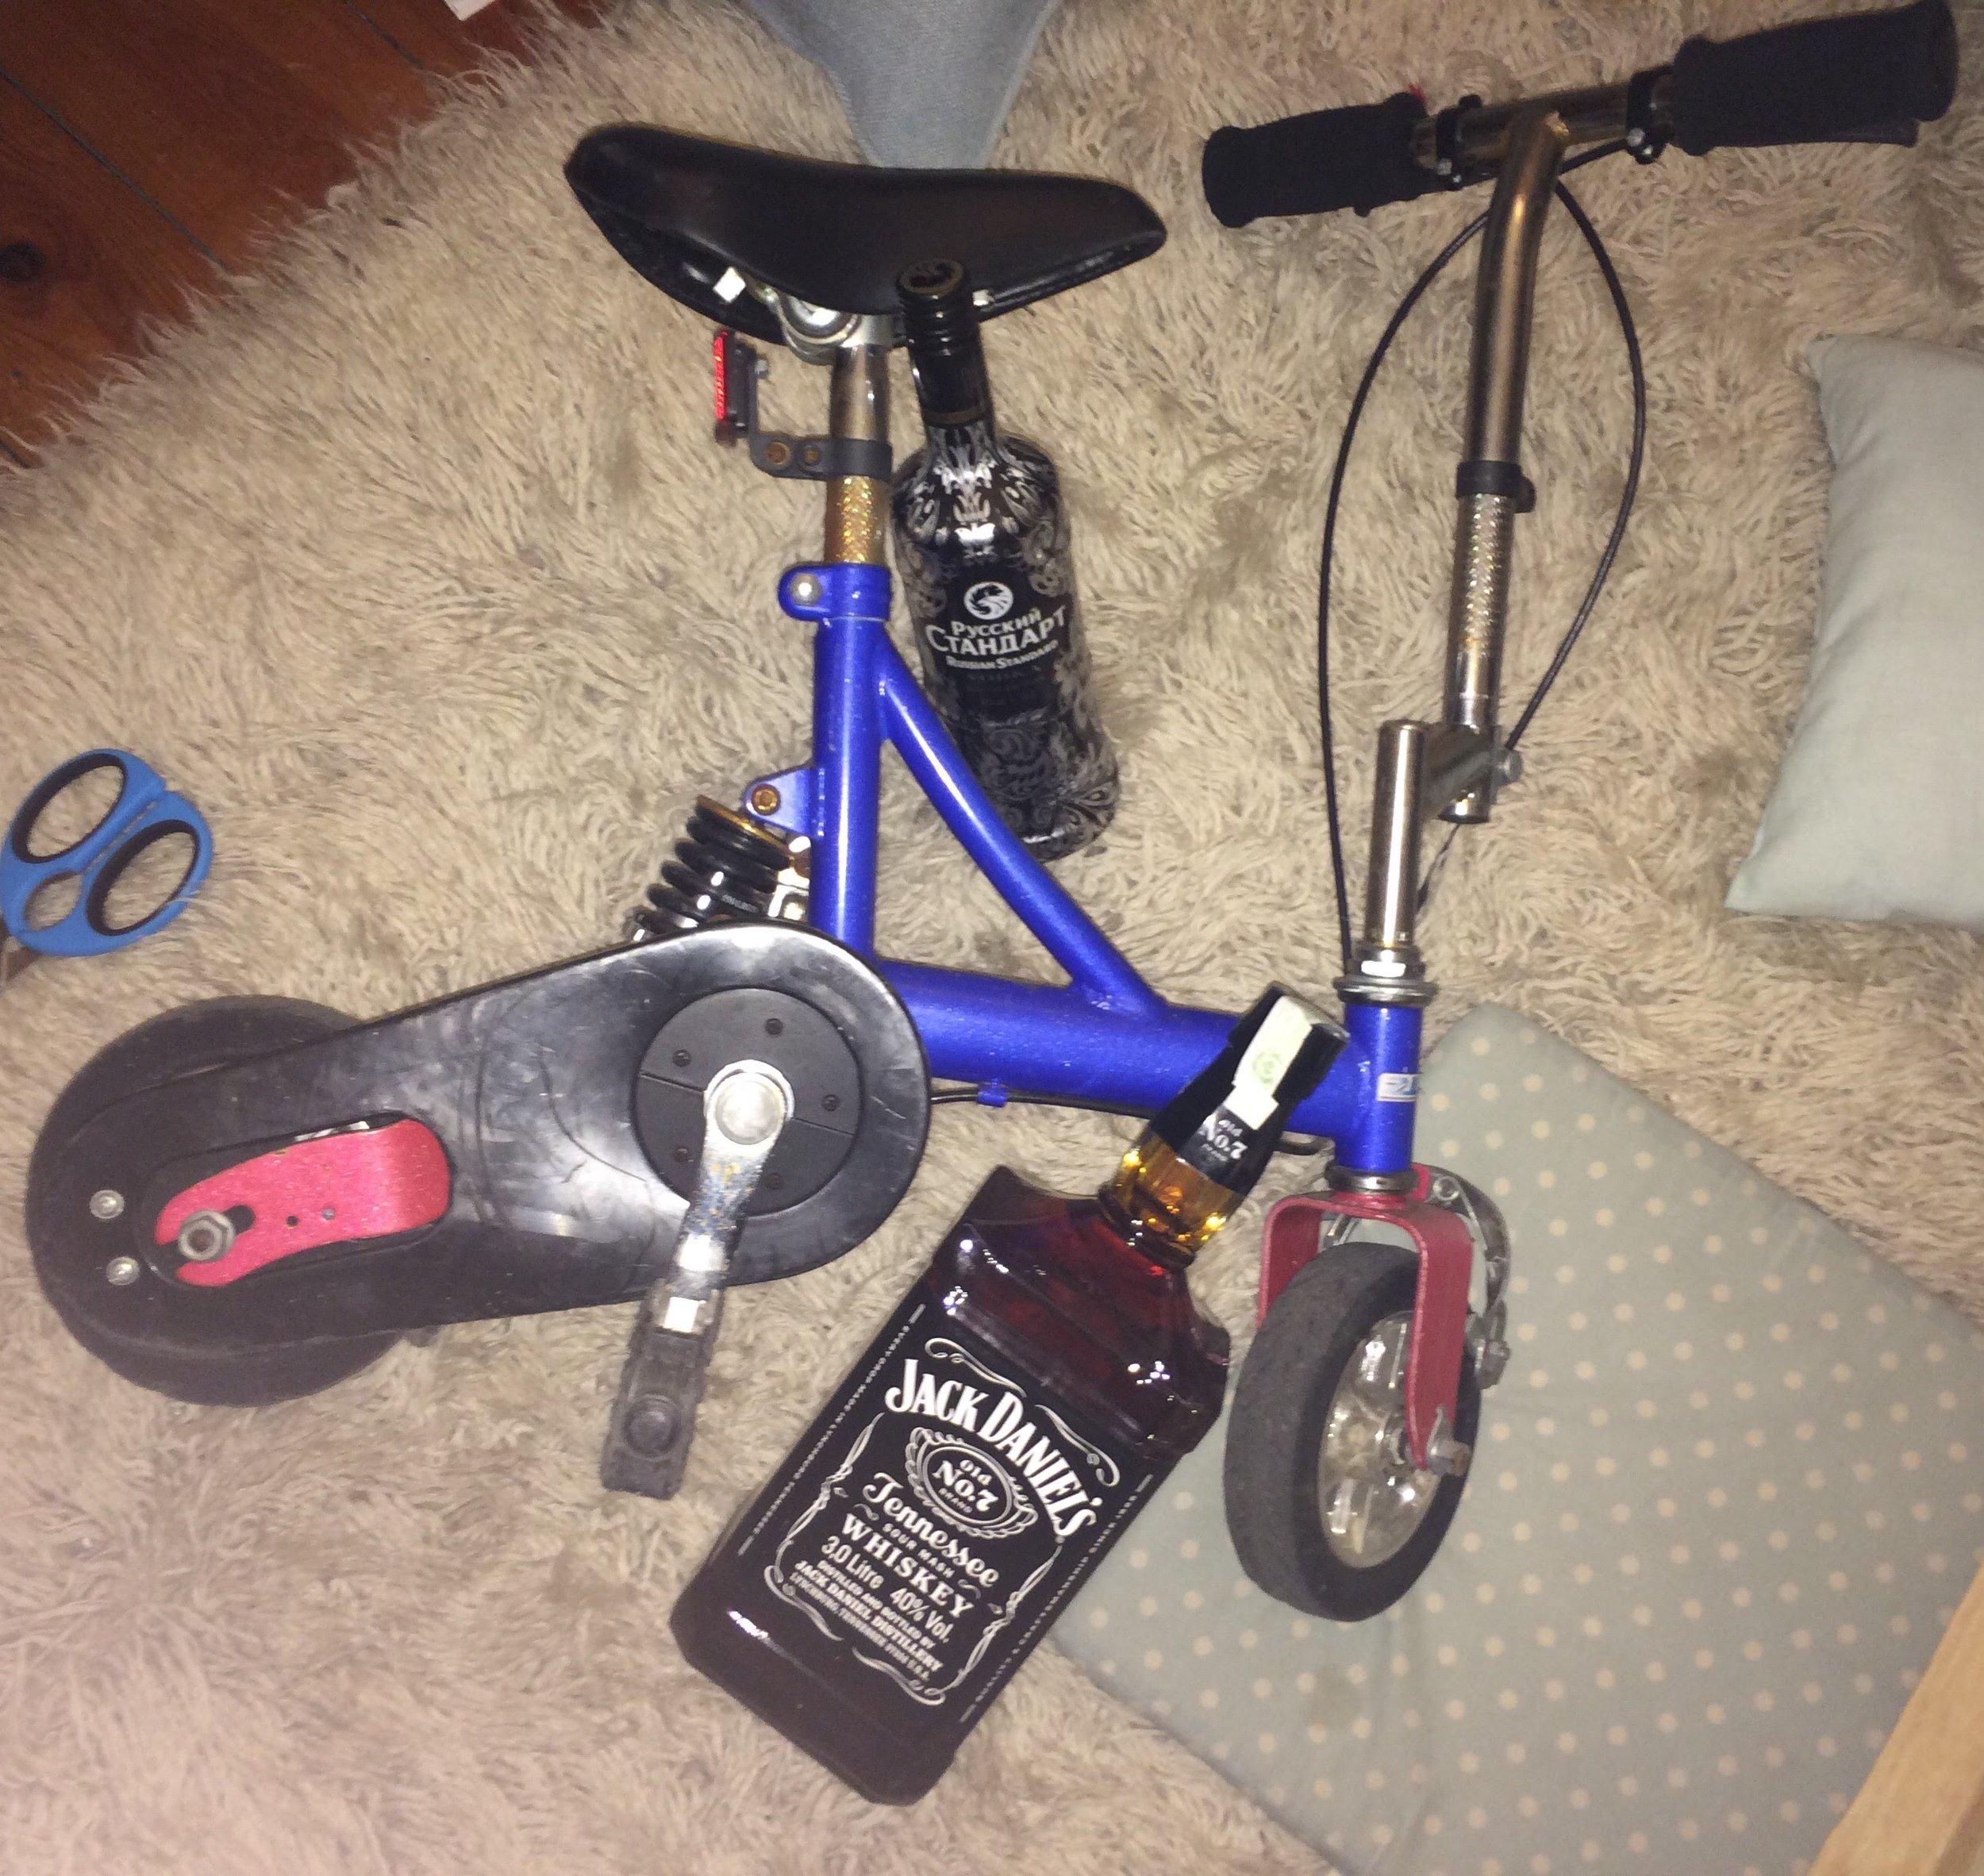 The minibike